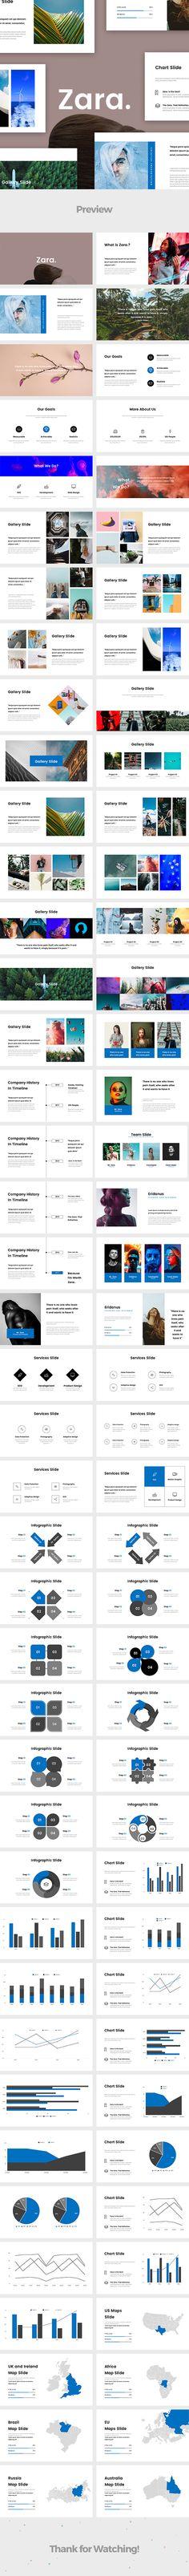 #Zara.# Keynote #Template - Keynote Templates Presentation Templates